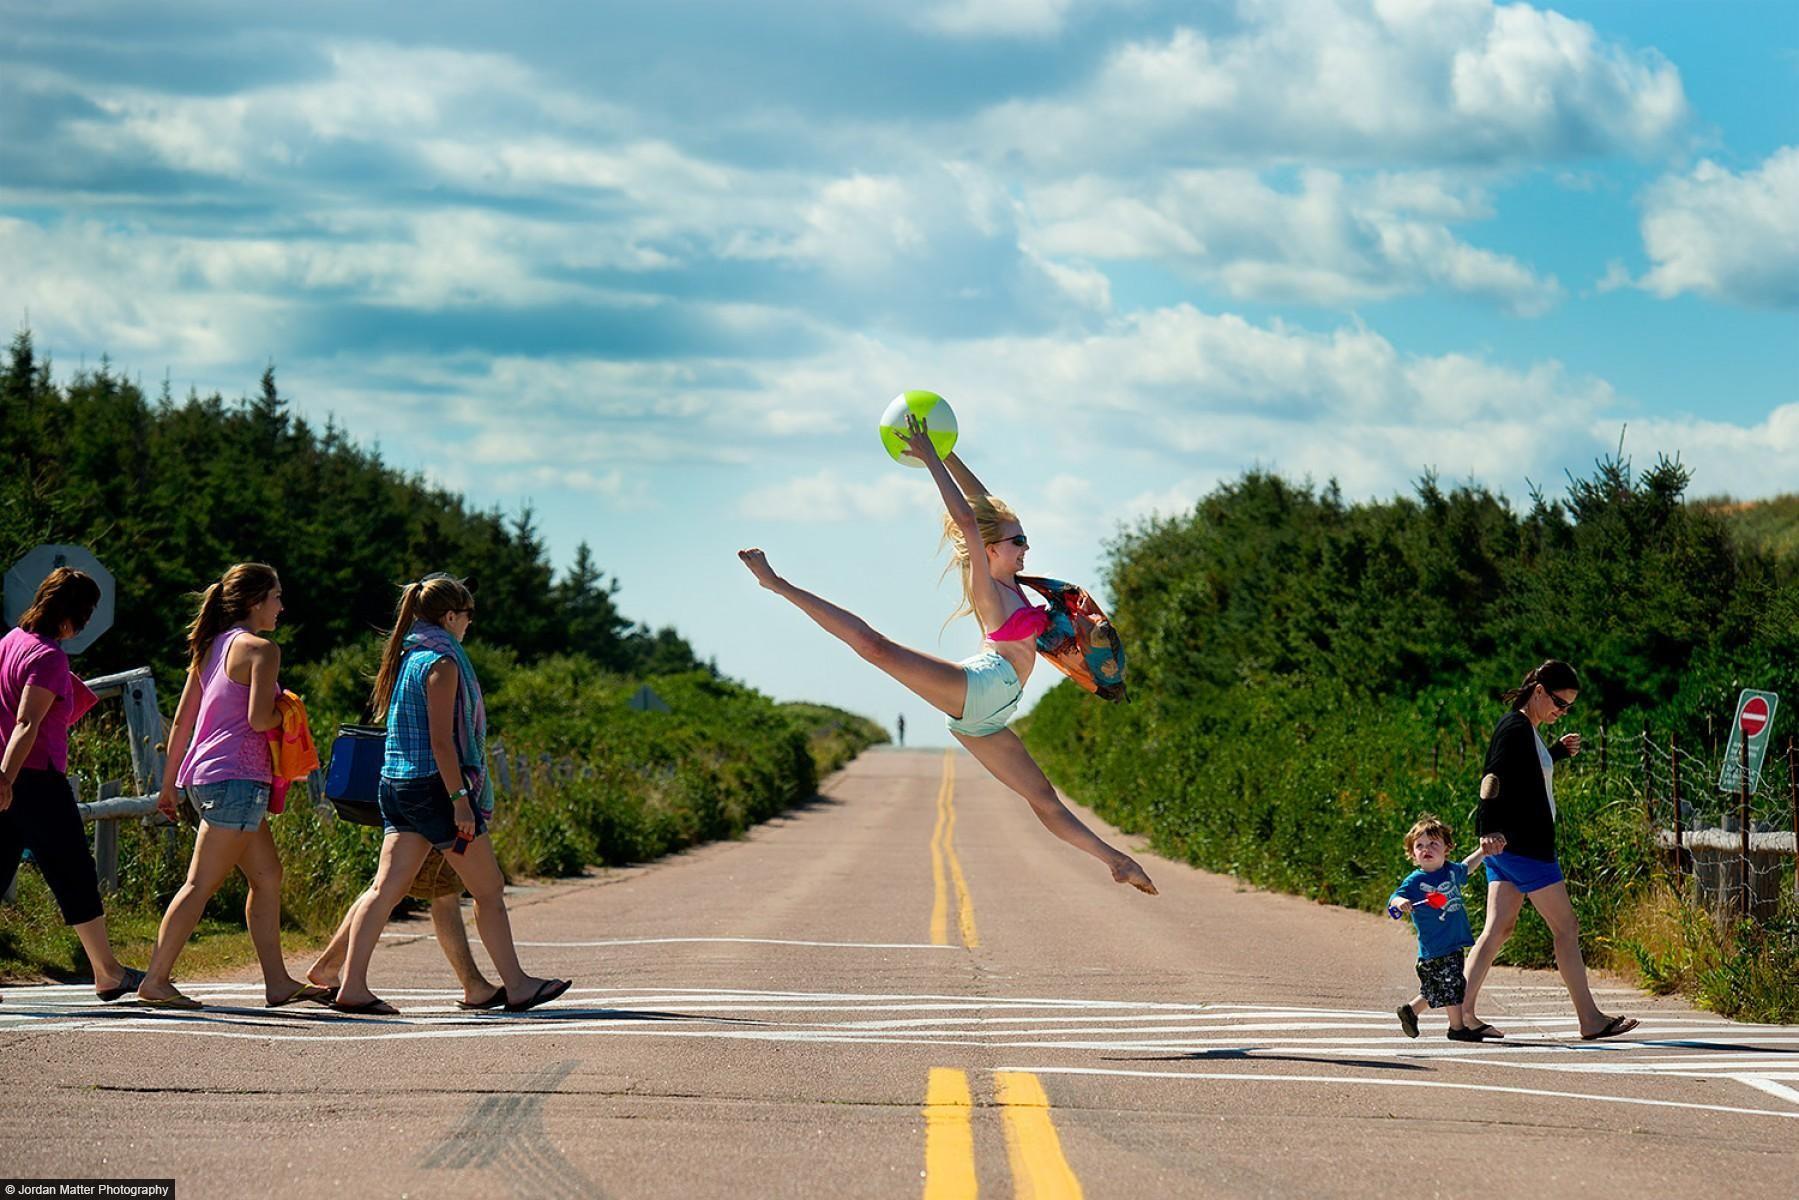 See this image of PEI, Canada - Jamie Stark in @JordanMatter's Dancers Among Us